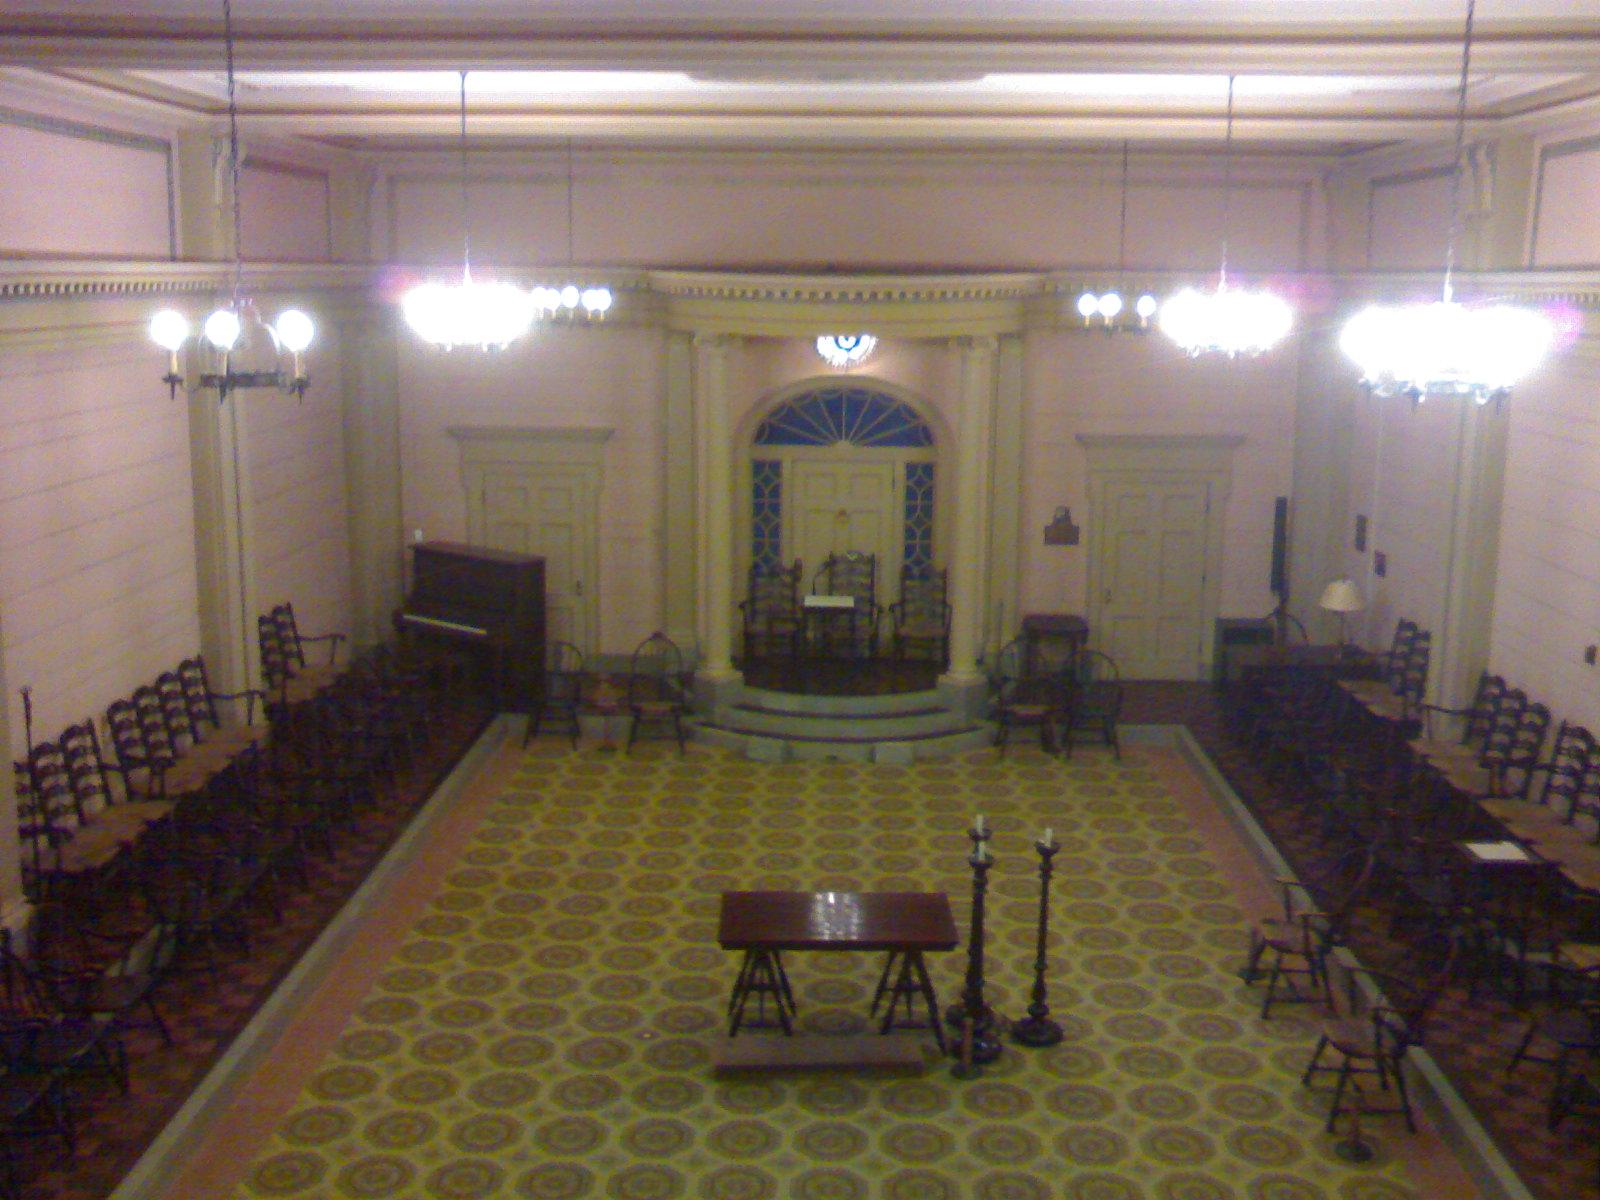 Masonic Lodge Room - Salt Lake Masonic Temple